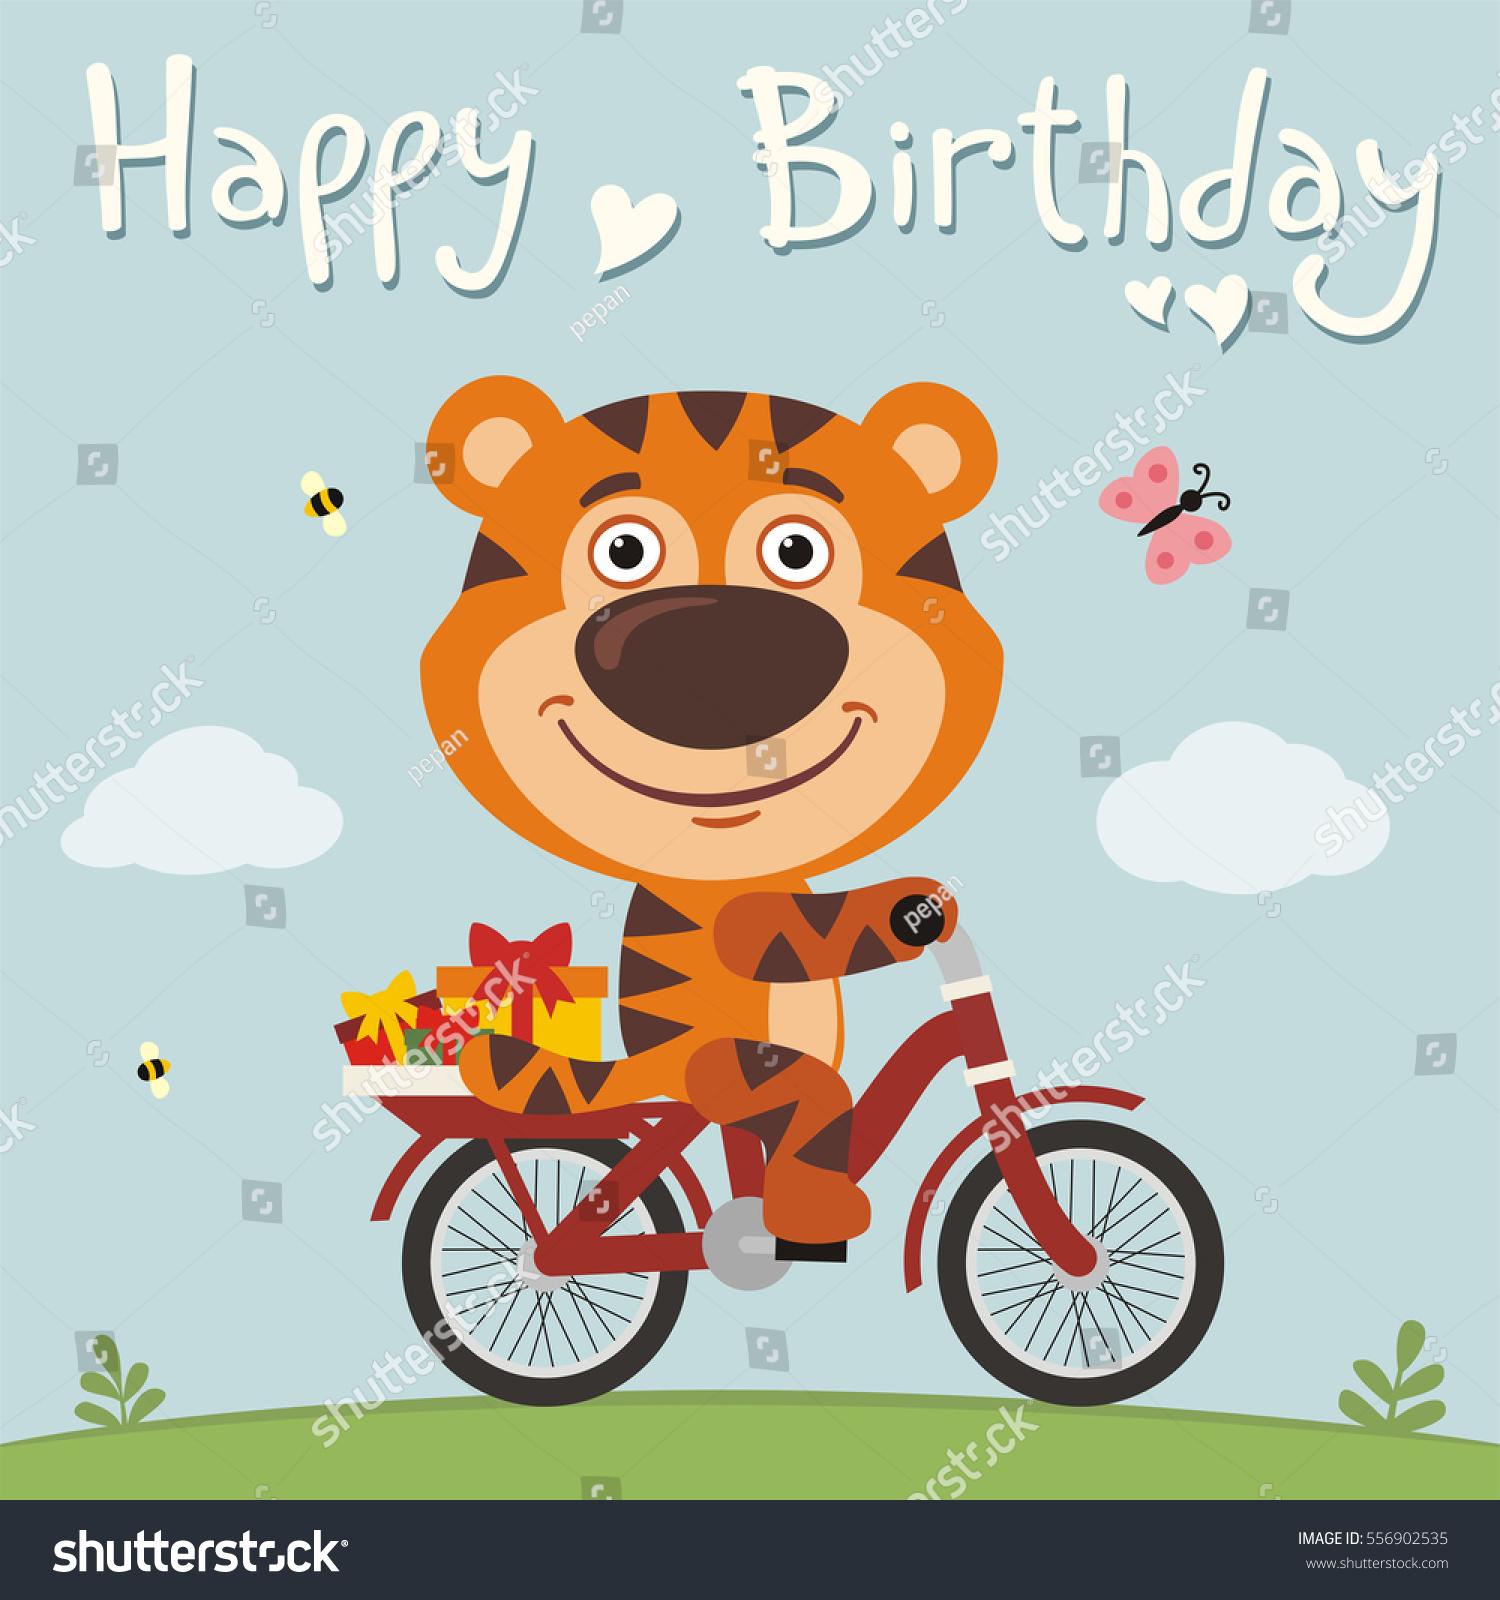 Happy Birthday Funny Tiger Bike Stock Vector